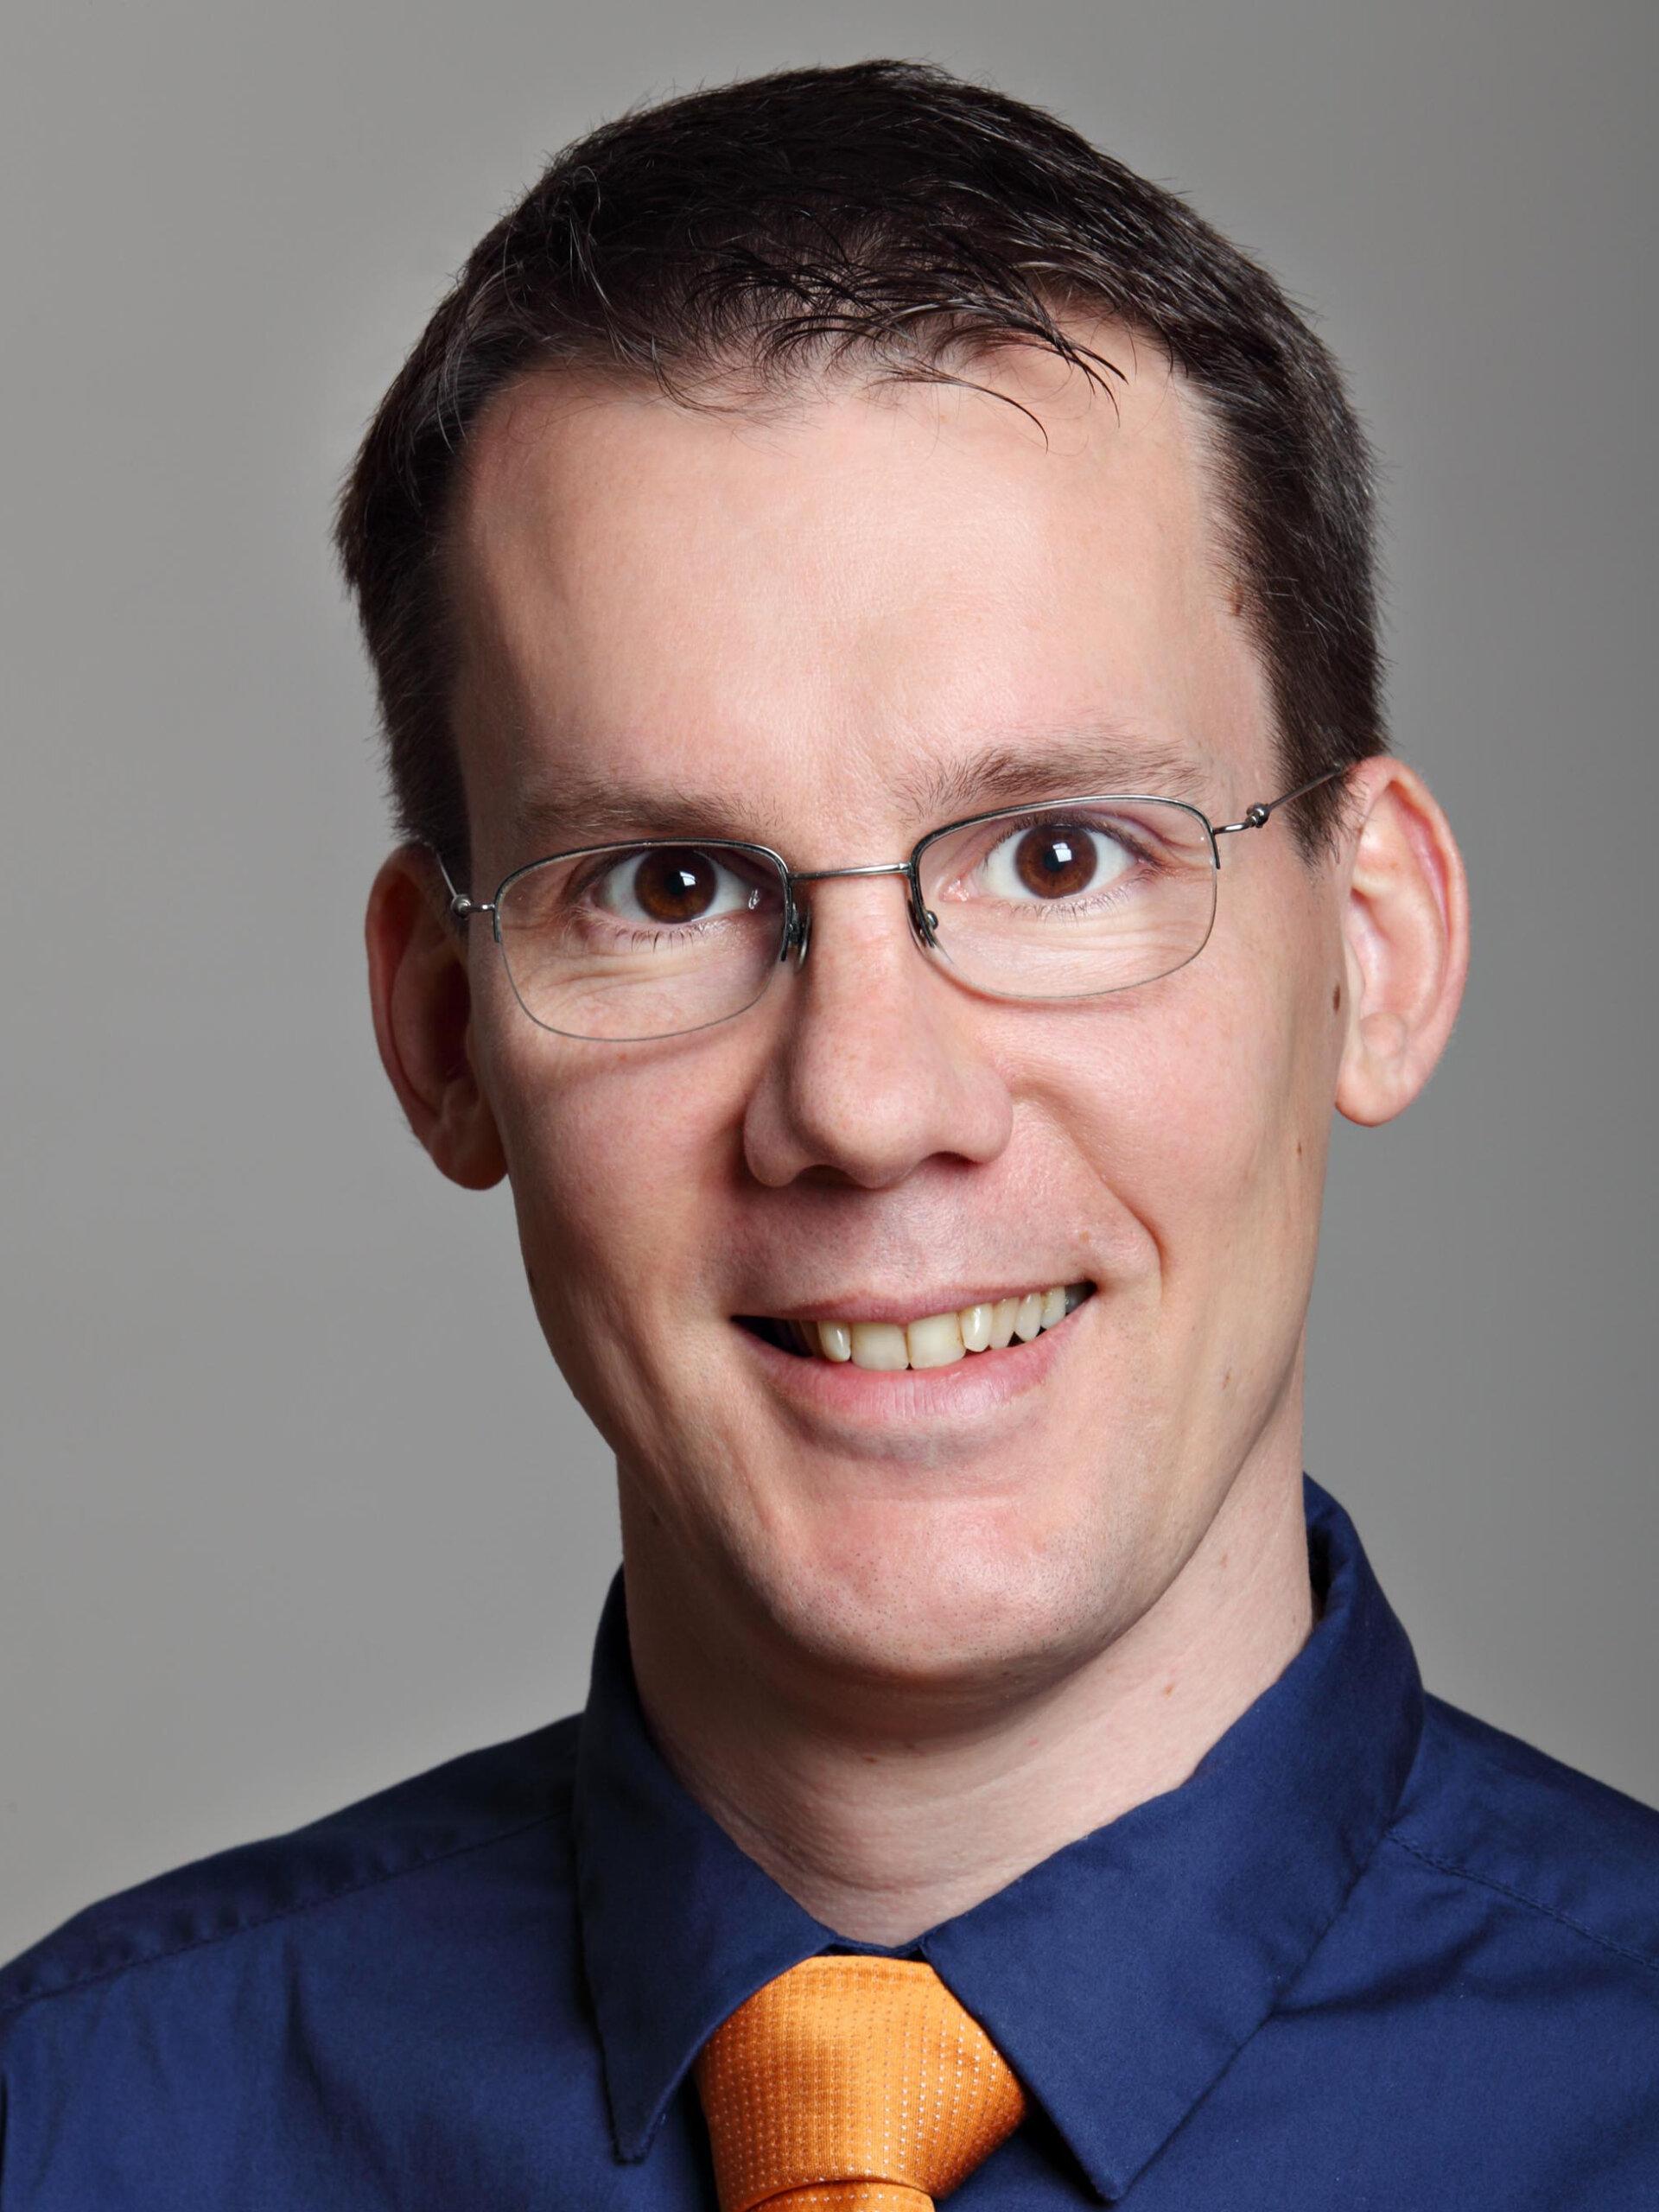 Gerhard Zucker Profilbild